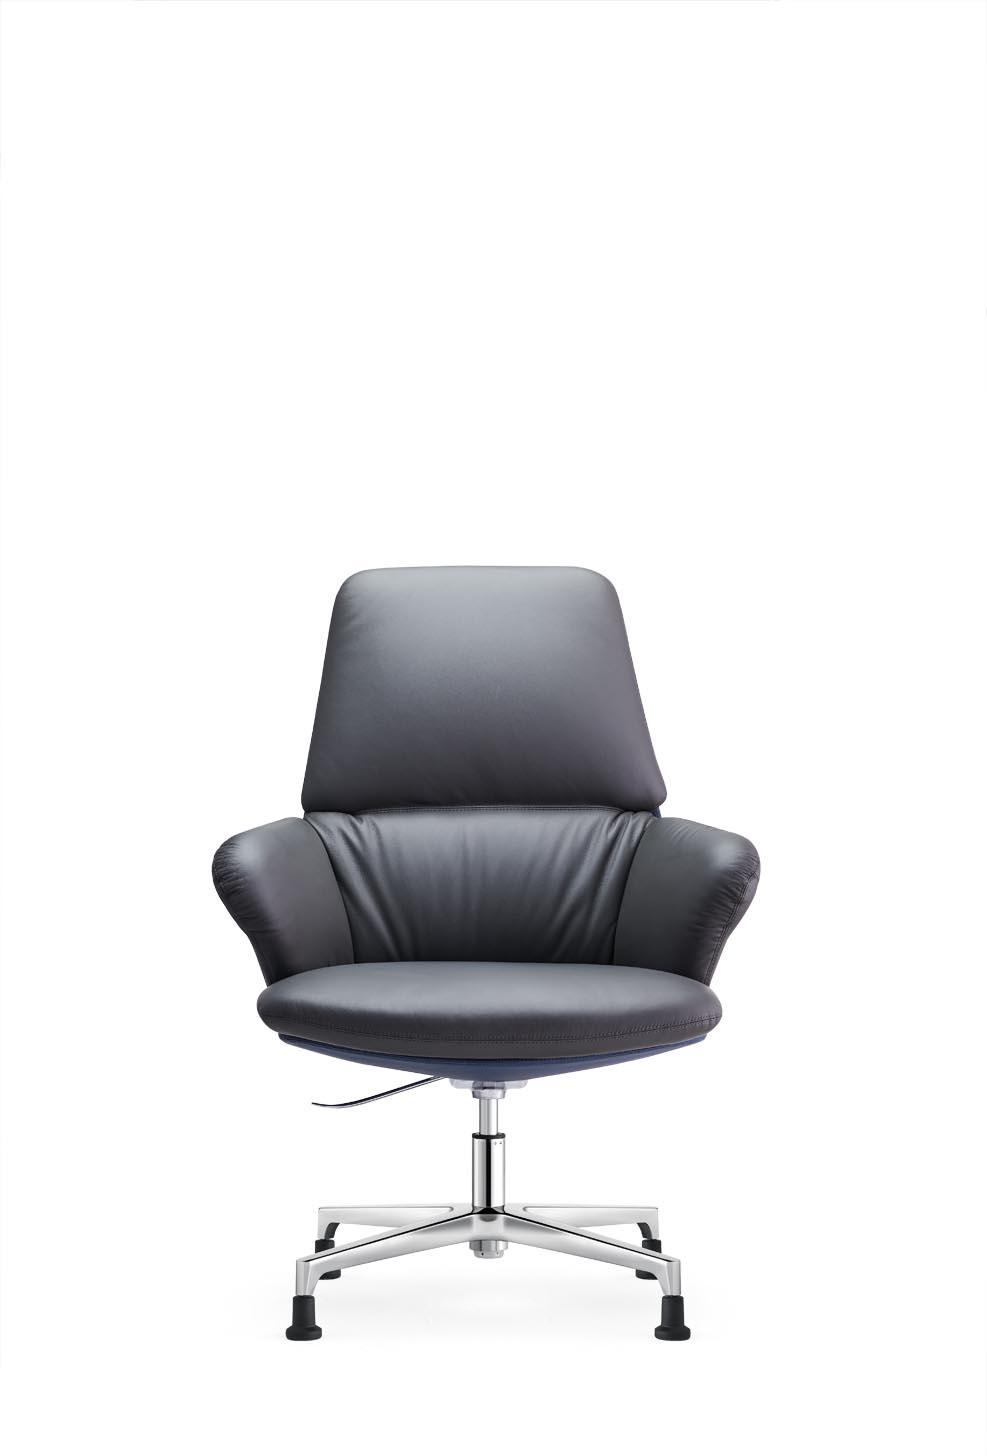 OP-BX60018 (2)